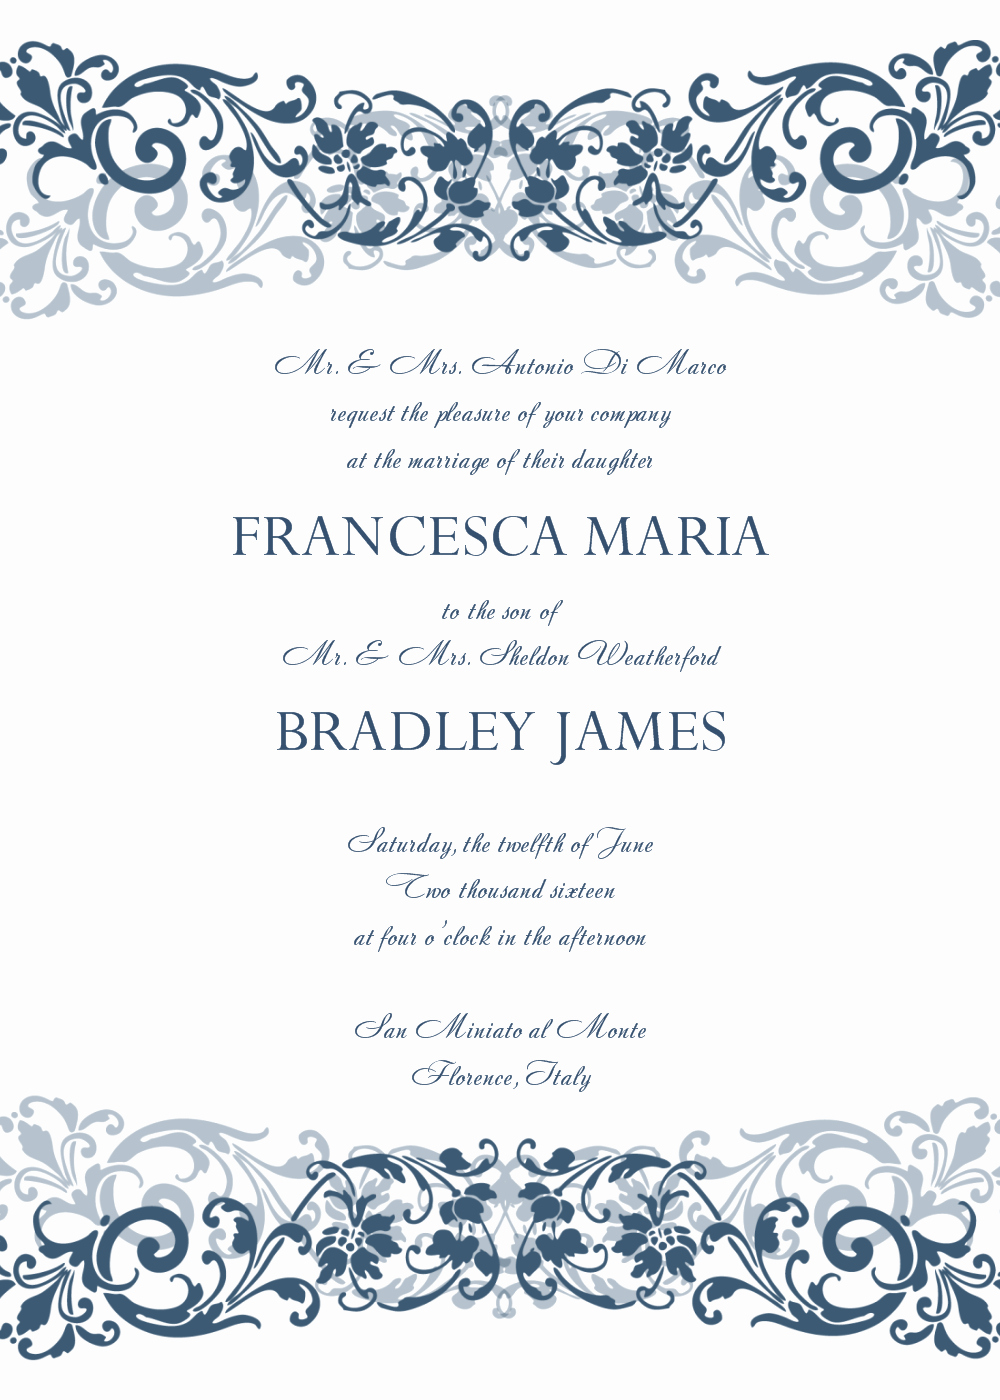 Free Invitation Templates Printable Beautiful 8 Free Wedding Invitation Templates Excel Pdf formats